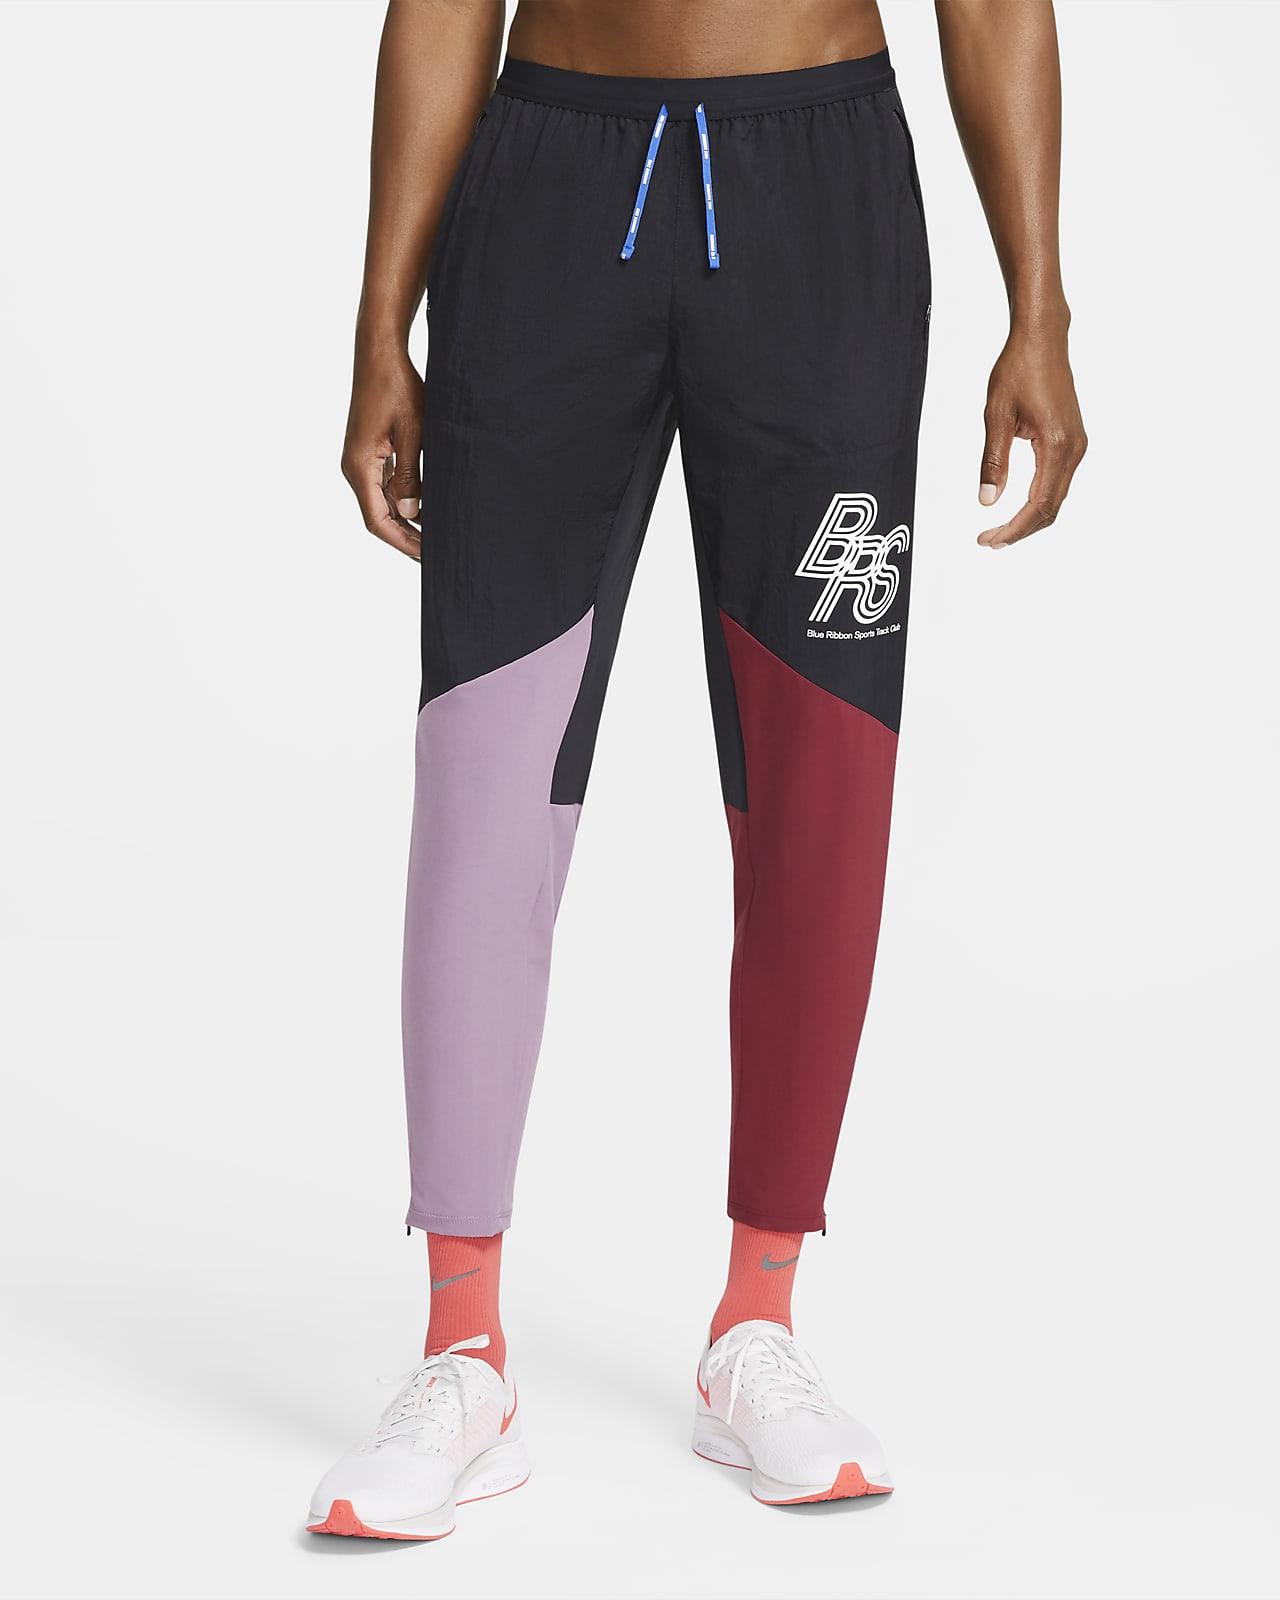 Nike Phenom Elite BRS Web-Laufhose für Herren